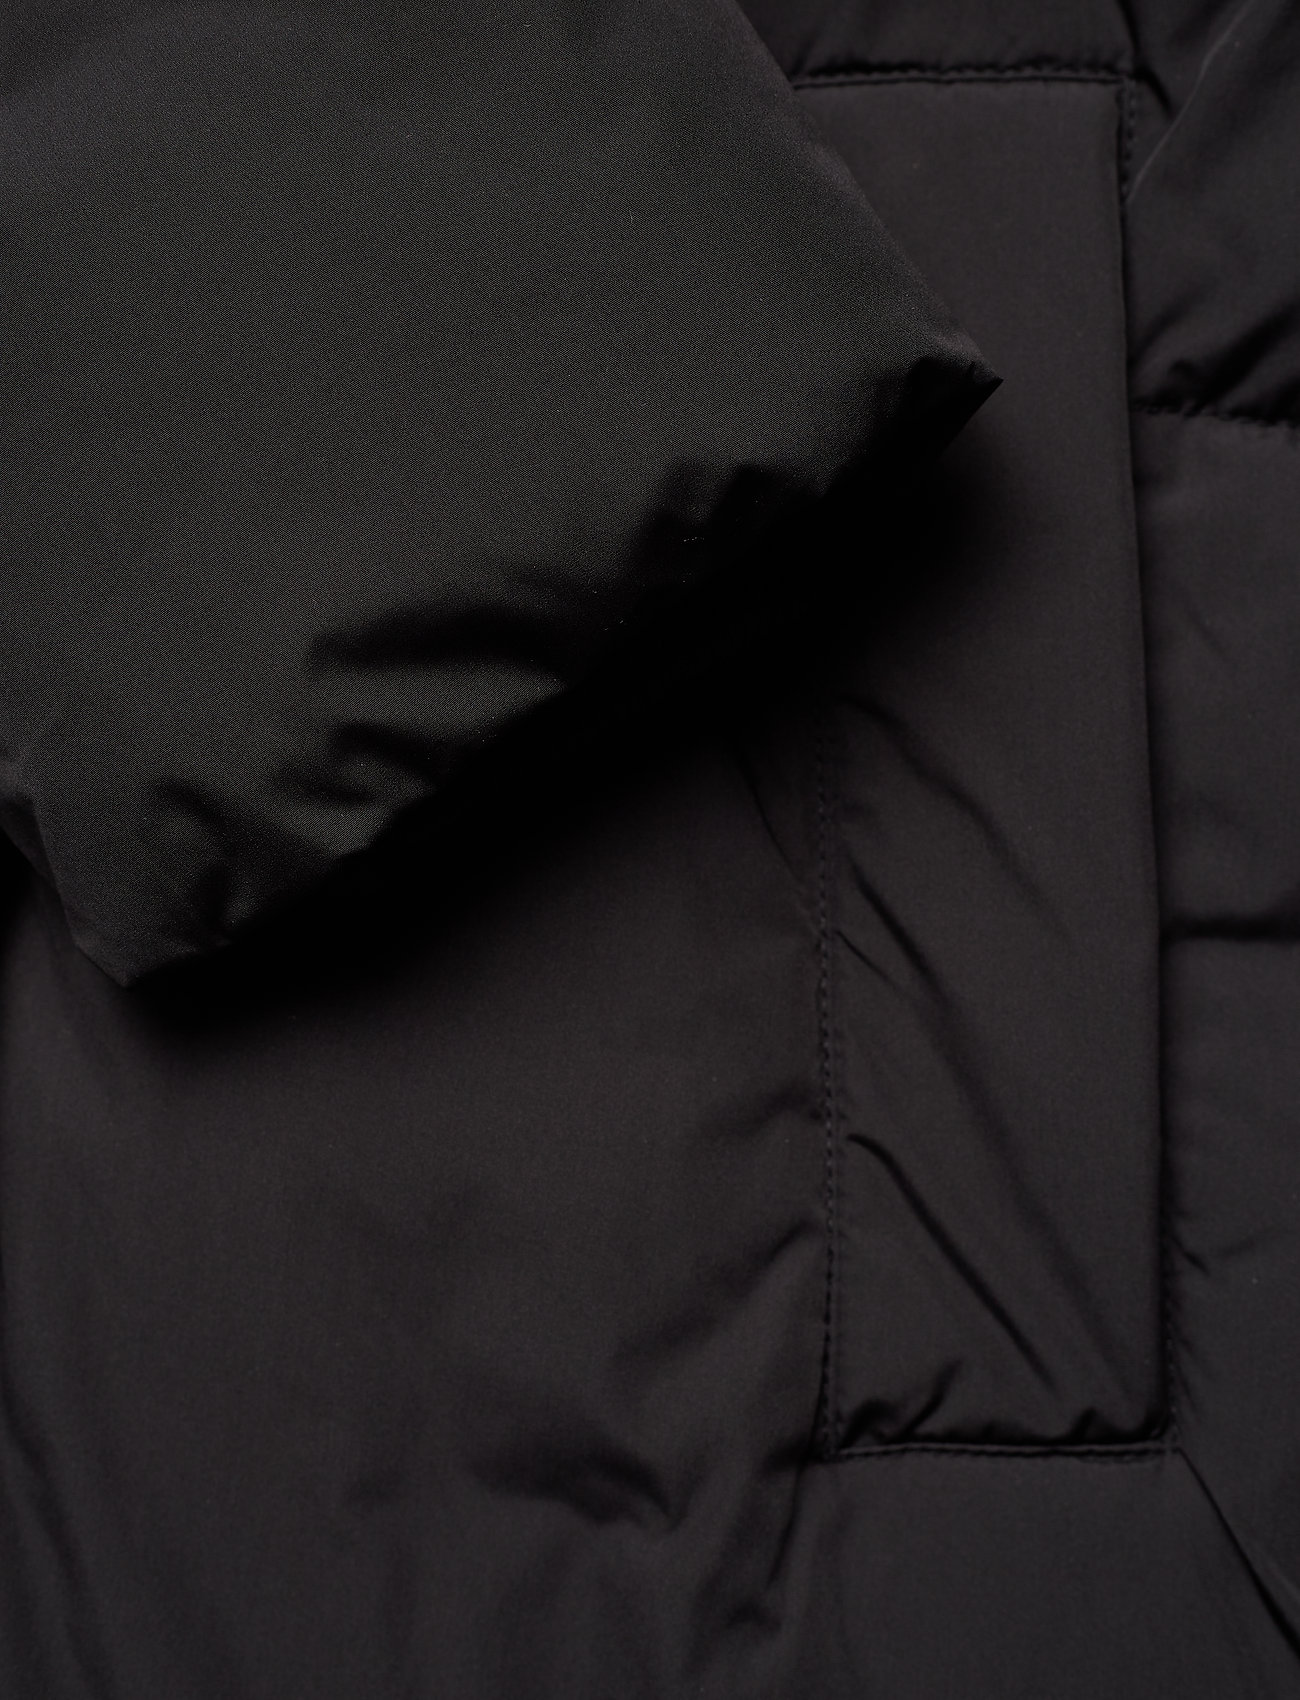 Merian (Black) (189.95 €) - mbyM xKdBb